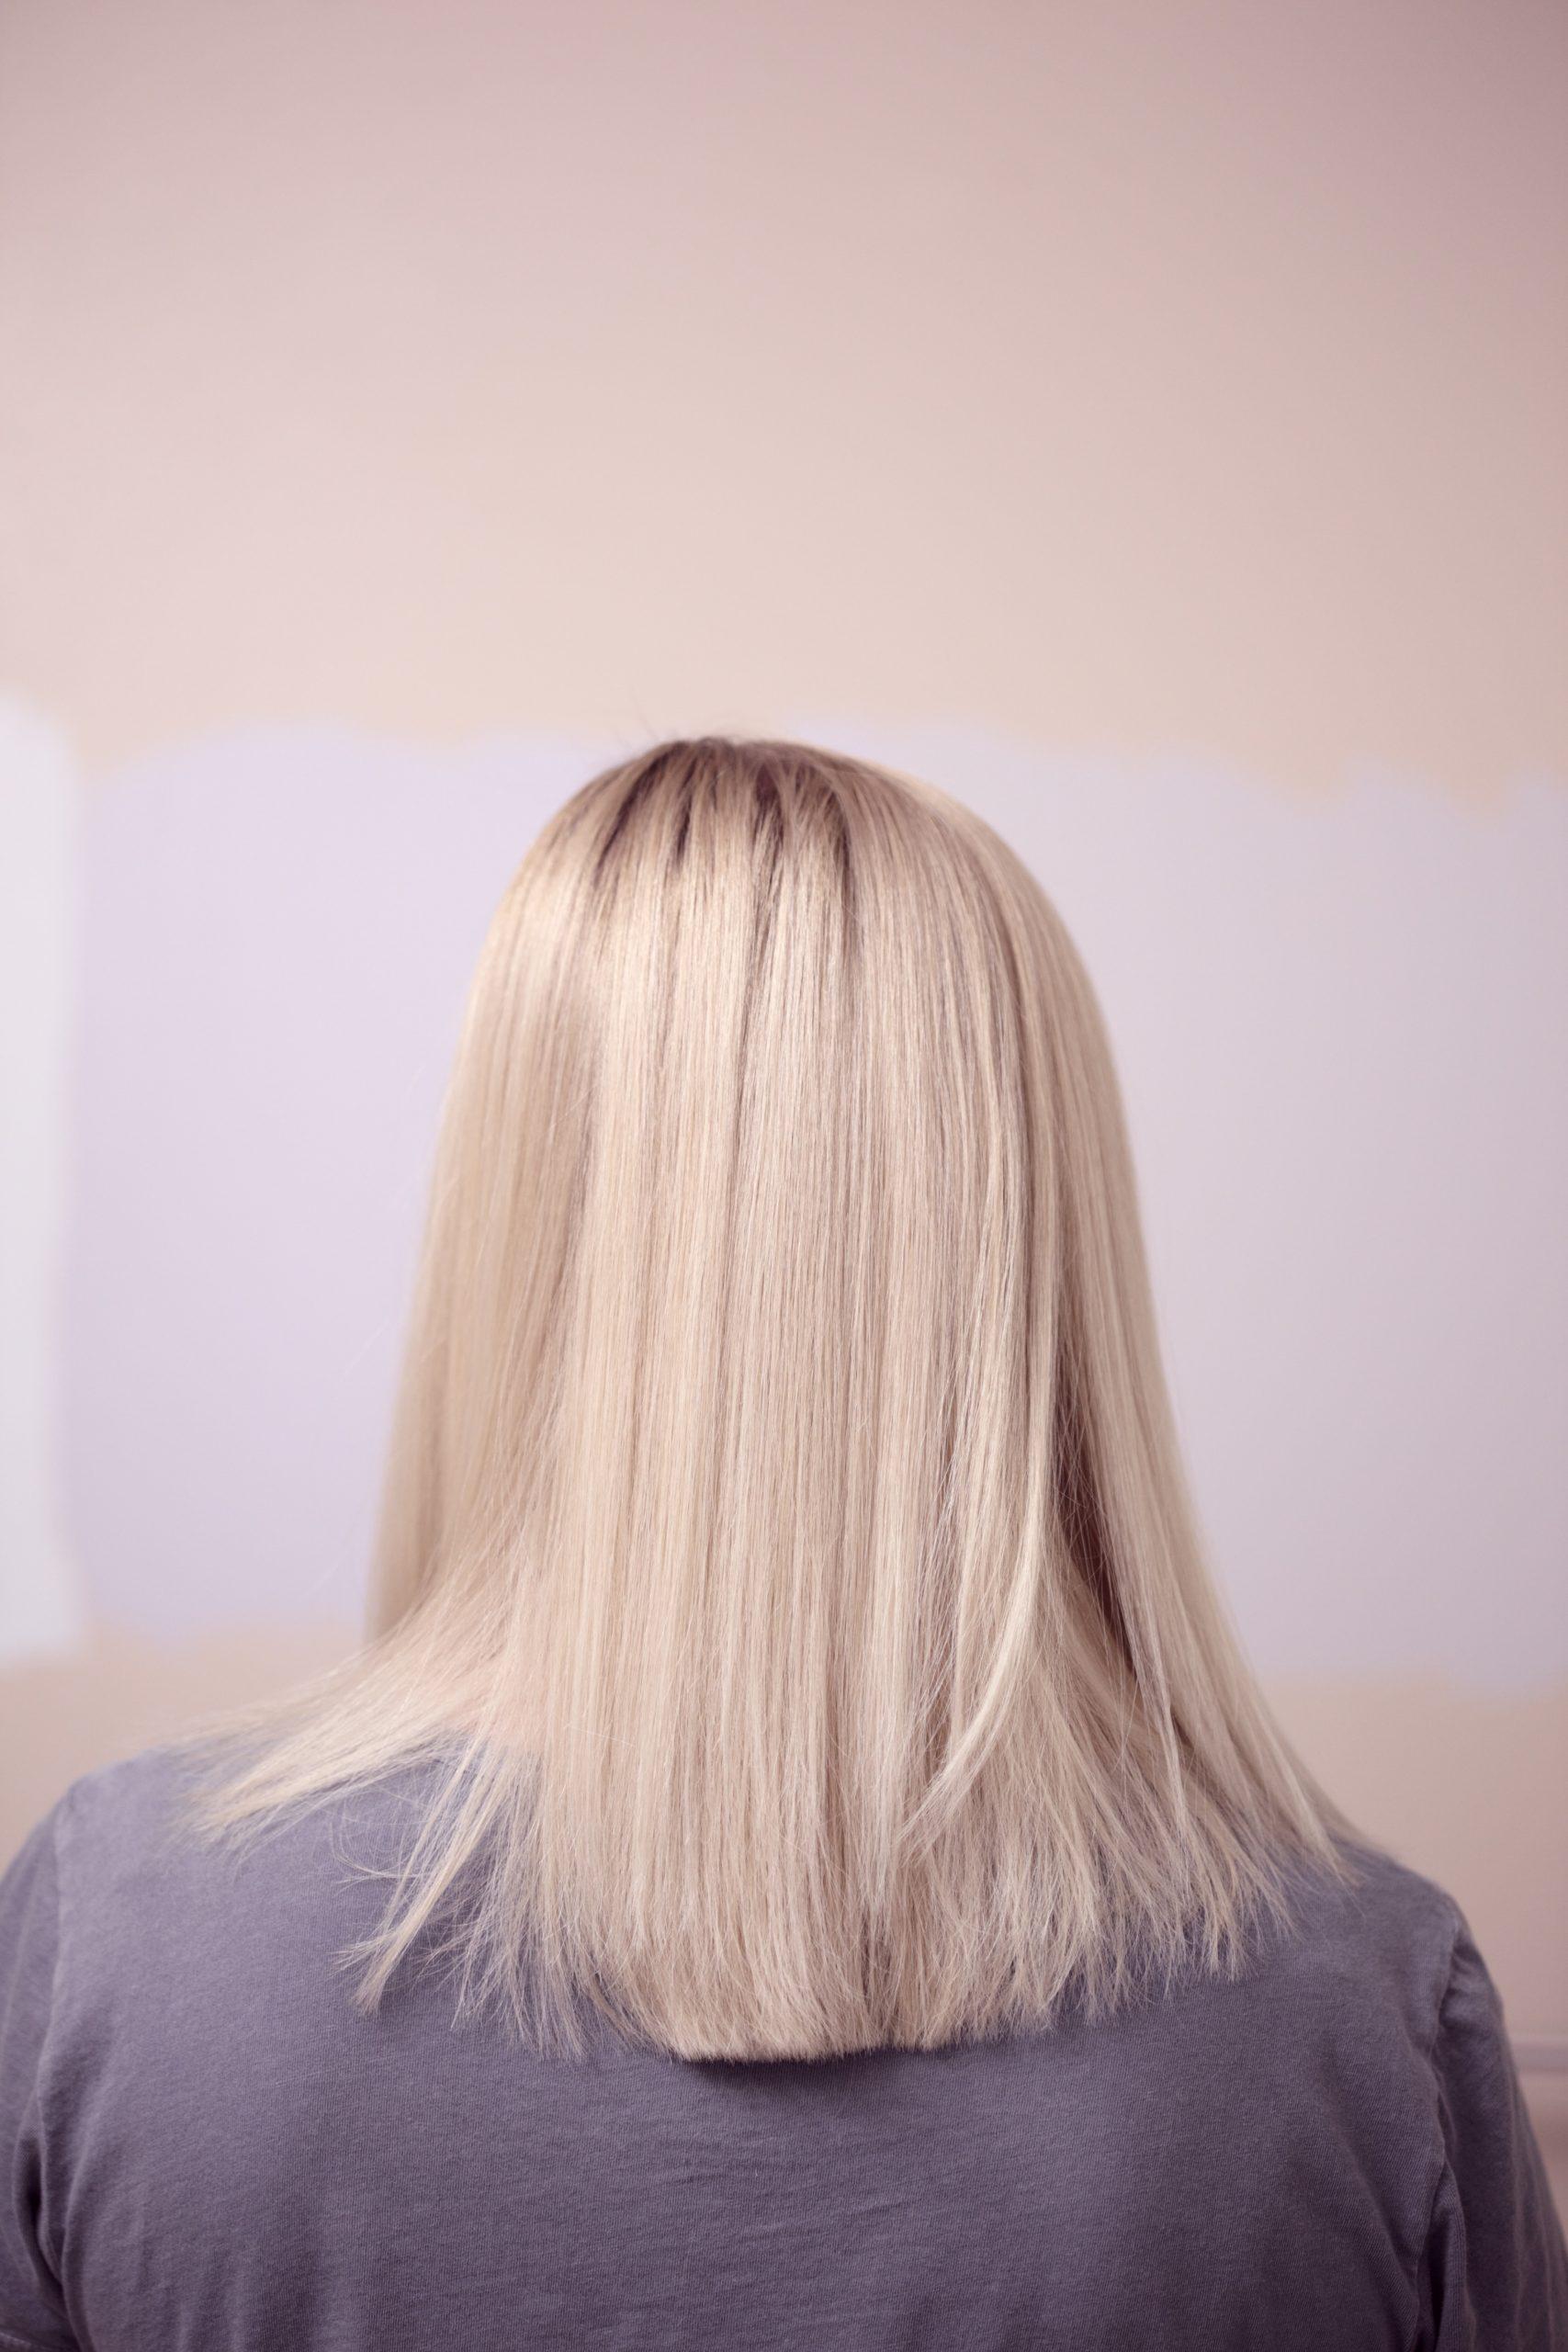 woman wearing gray top